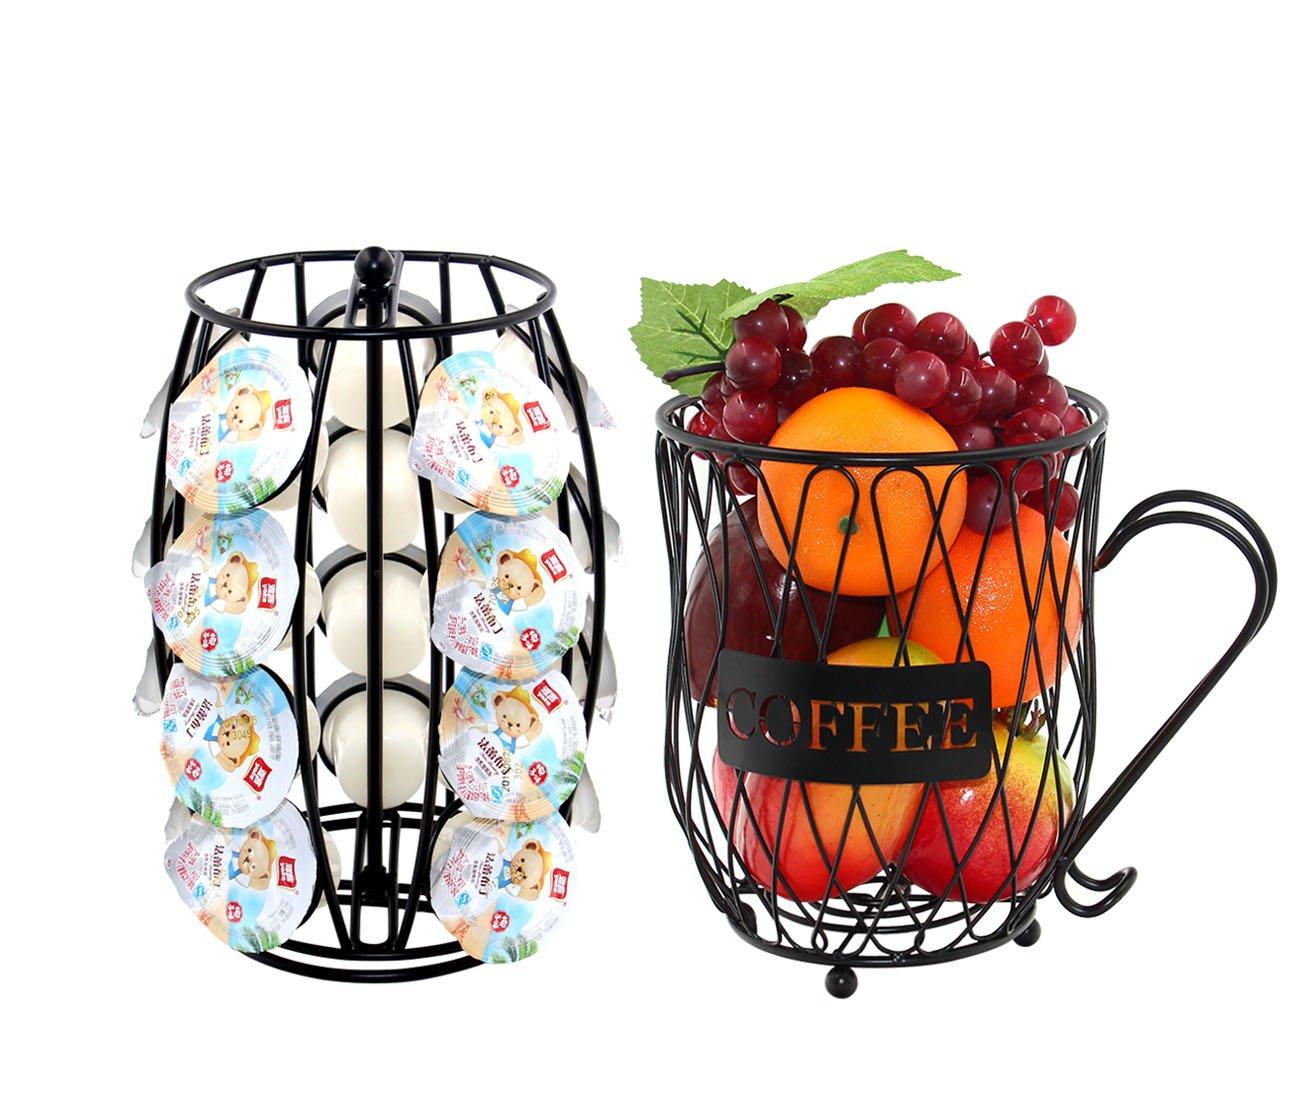 PAG Metal Rotating 20 K Cups Coffee & Espresso Pod Holders and Organizer Mug Fruit Storage Basket for Kitchen, Black